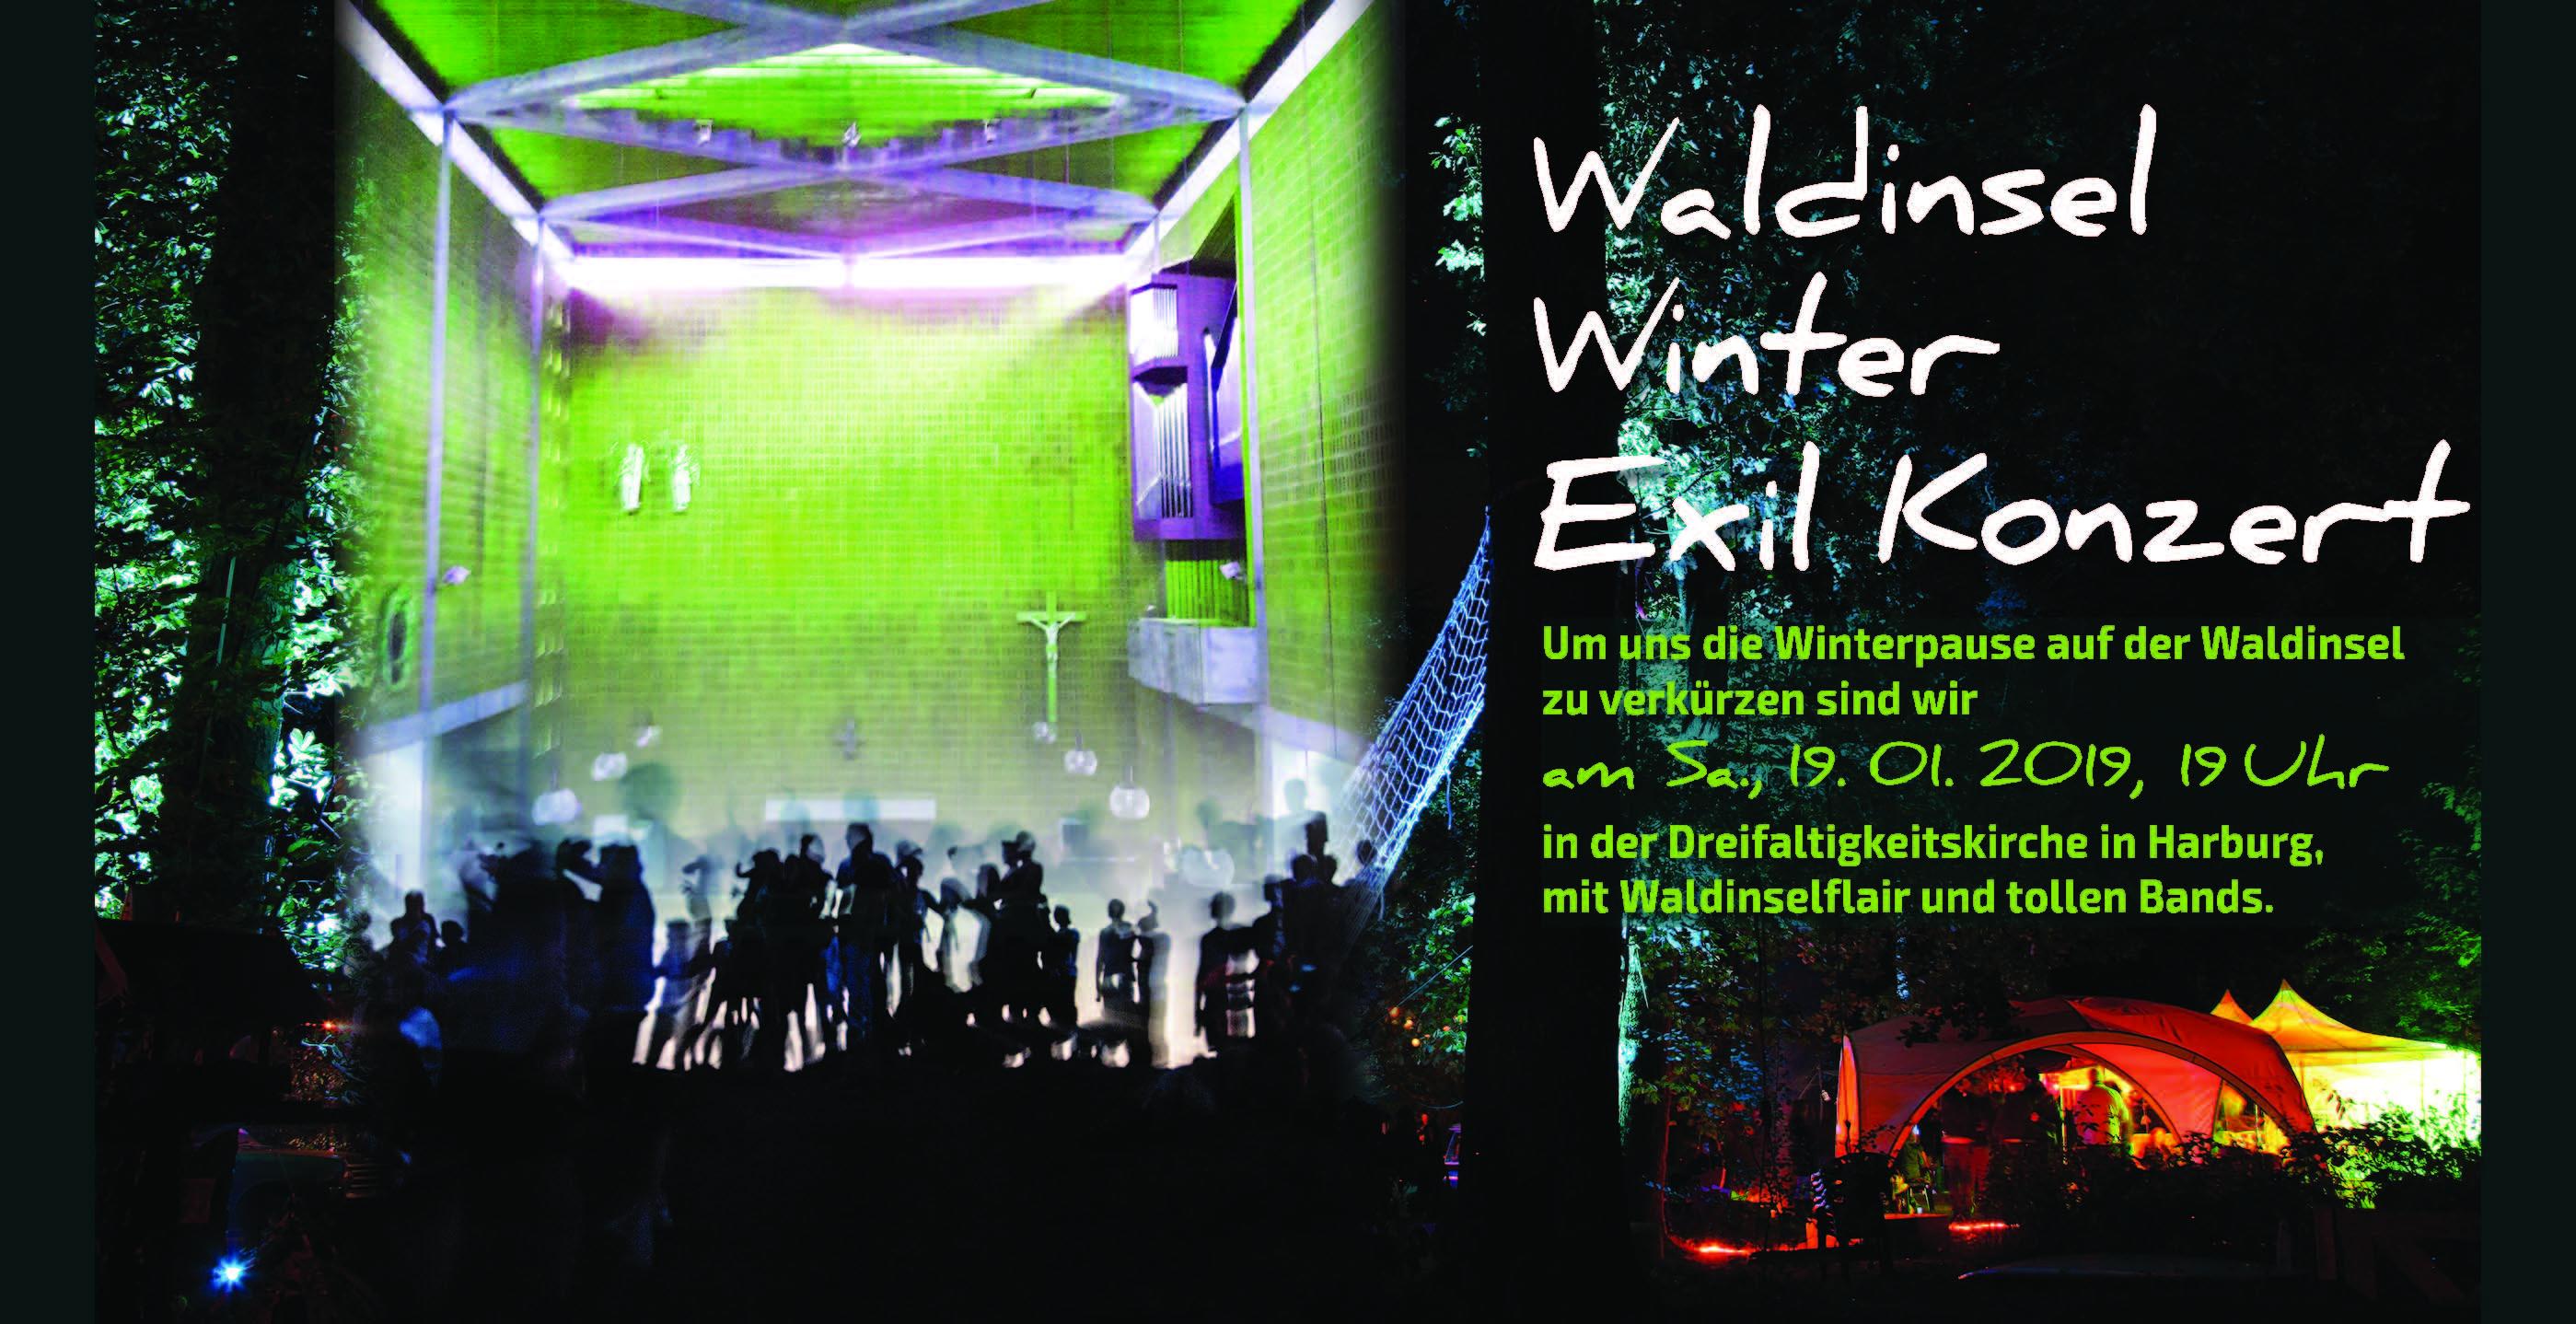 Waldinsel Exil Konzert 19.01.2019 Druck LangDin Seite 1 Waldinsel Exil Konzert